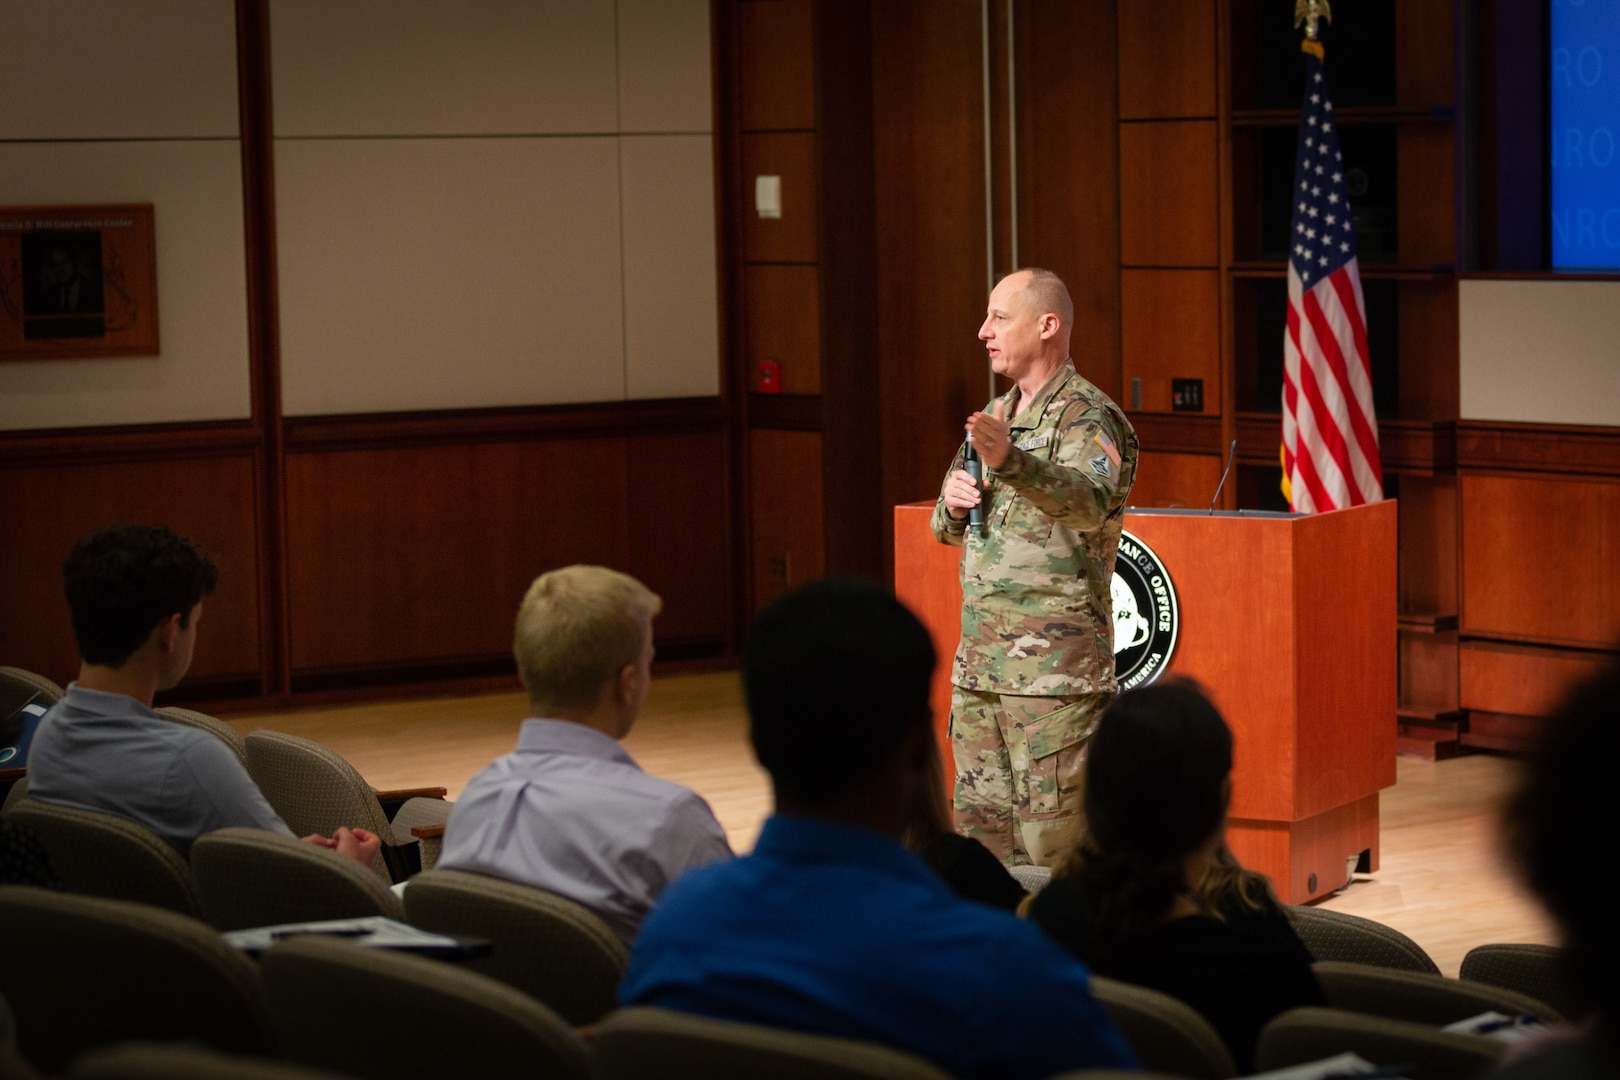 Maj. Gen. Gutlein addresses the second class of the NRO student internship program (June 9, 2021)